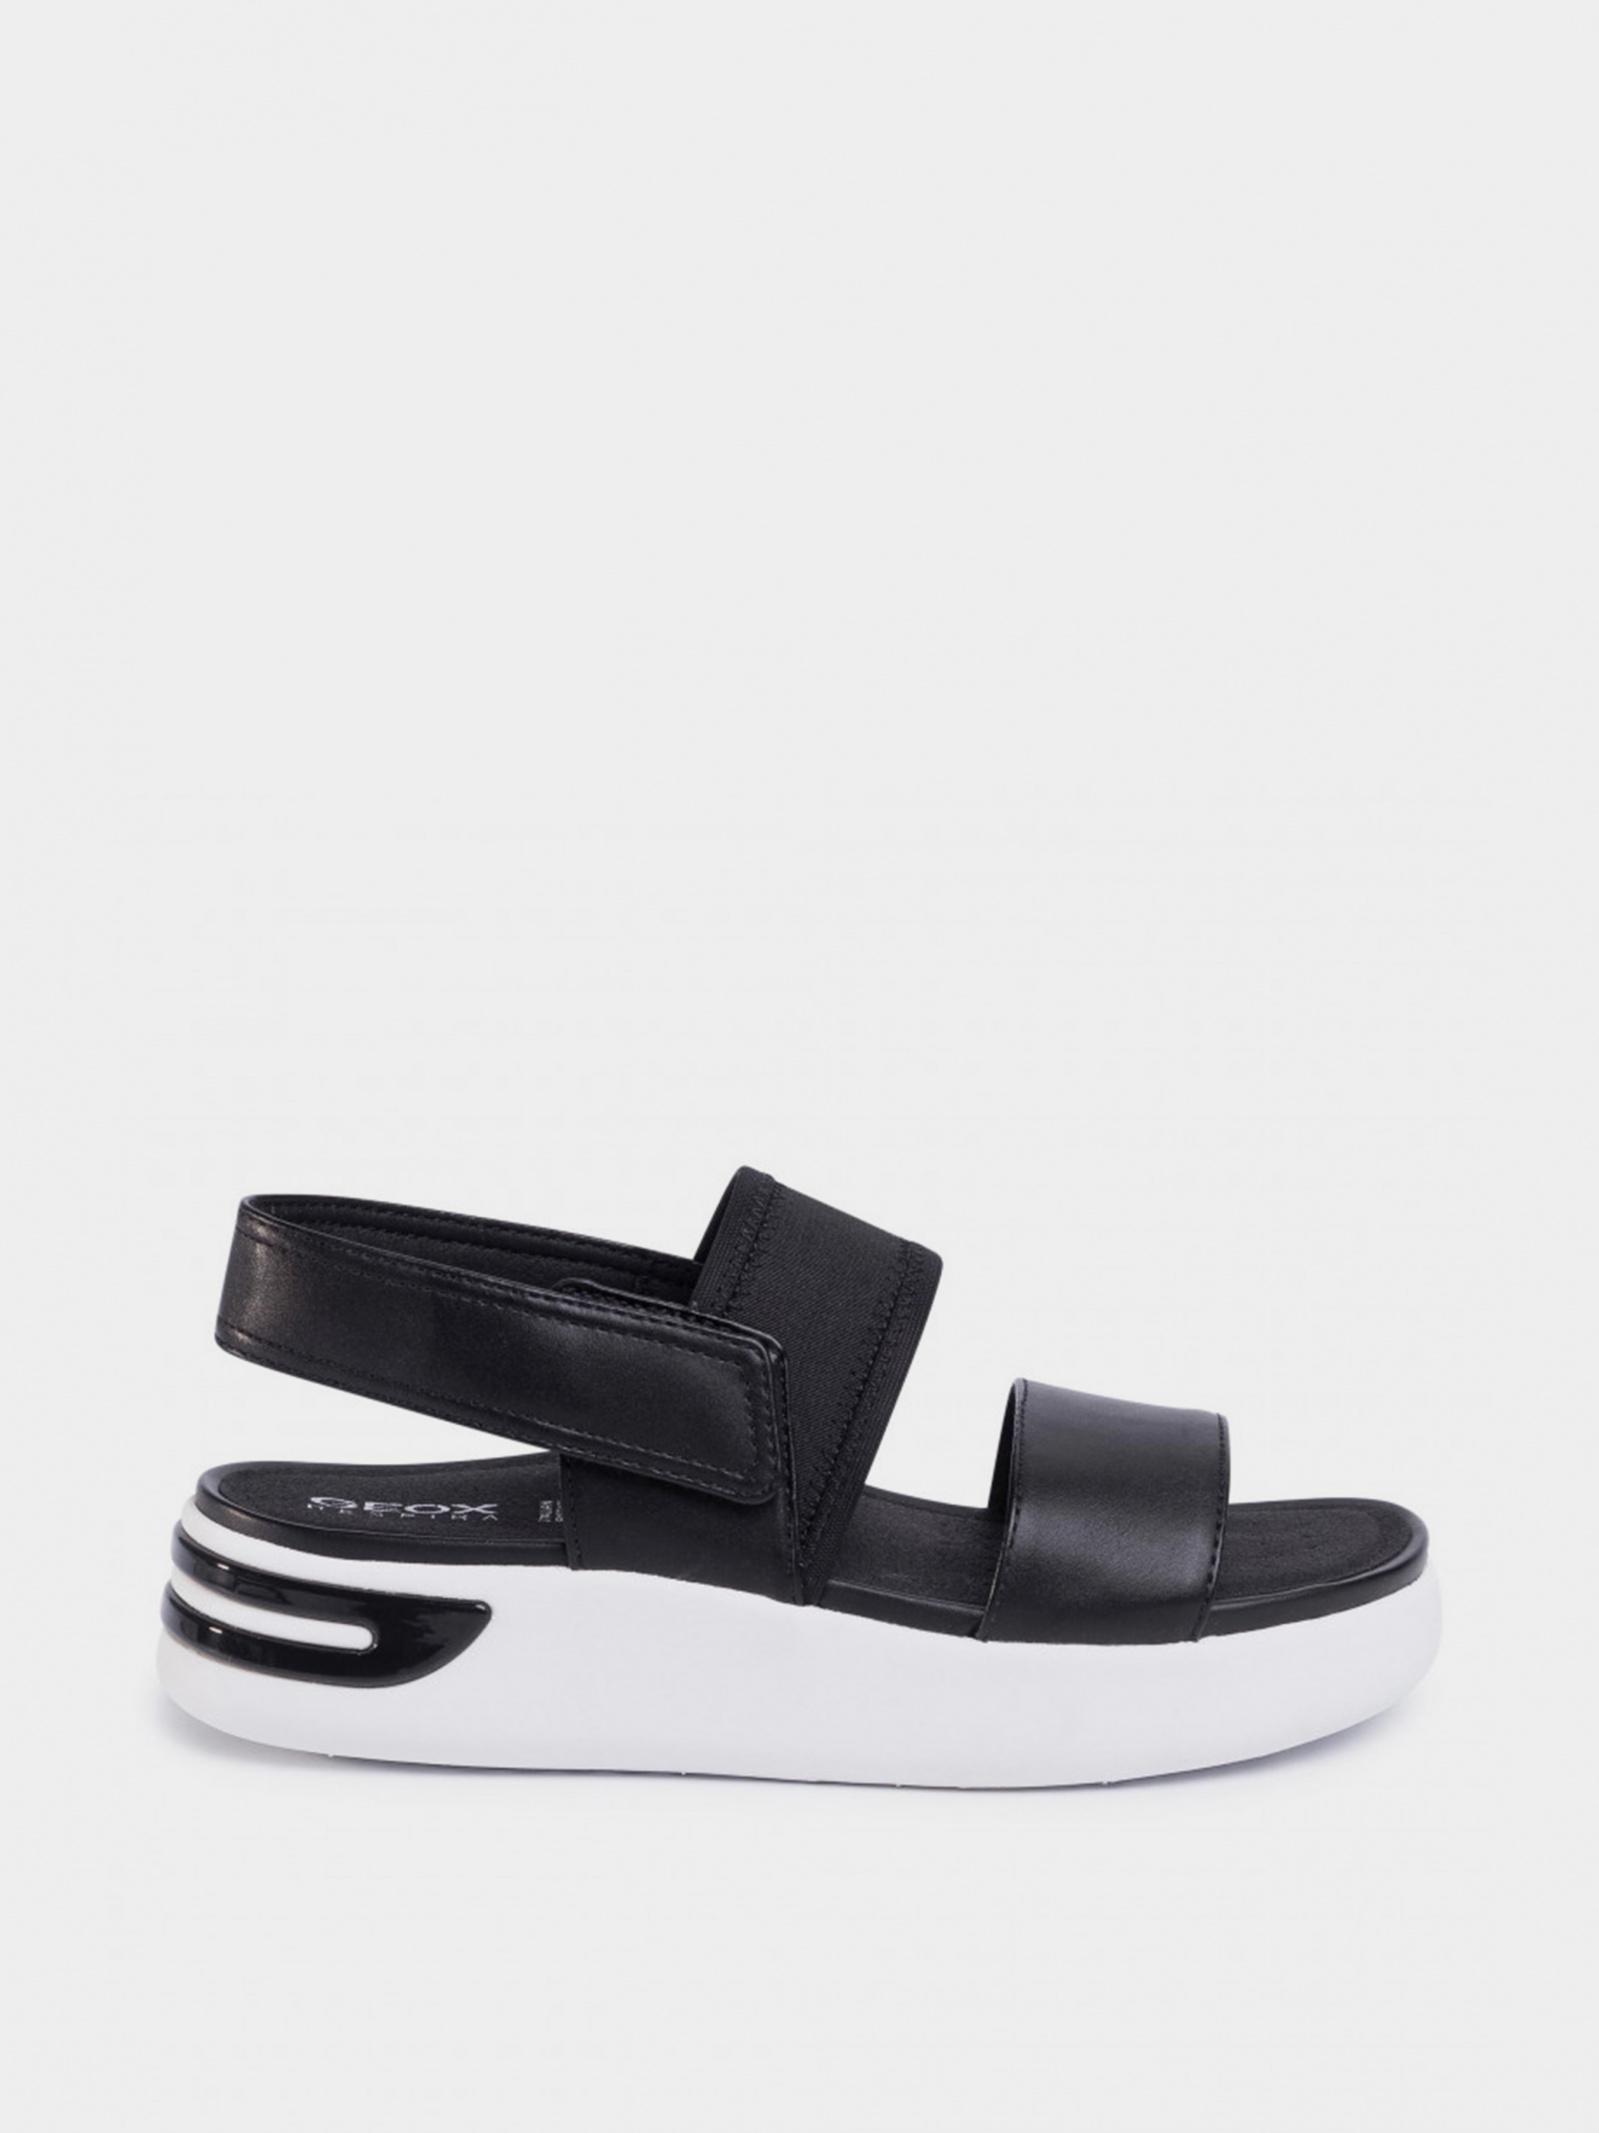 Сандалии для женщин Geox D OTTAYA SANDAL D02CMB-000BC-C9999 размерная сетка обуви, 2017